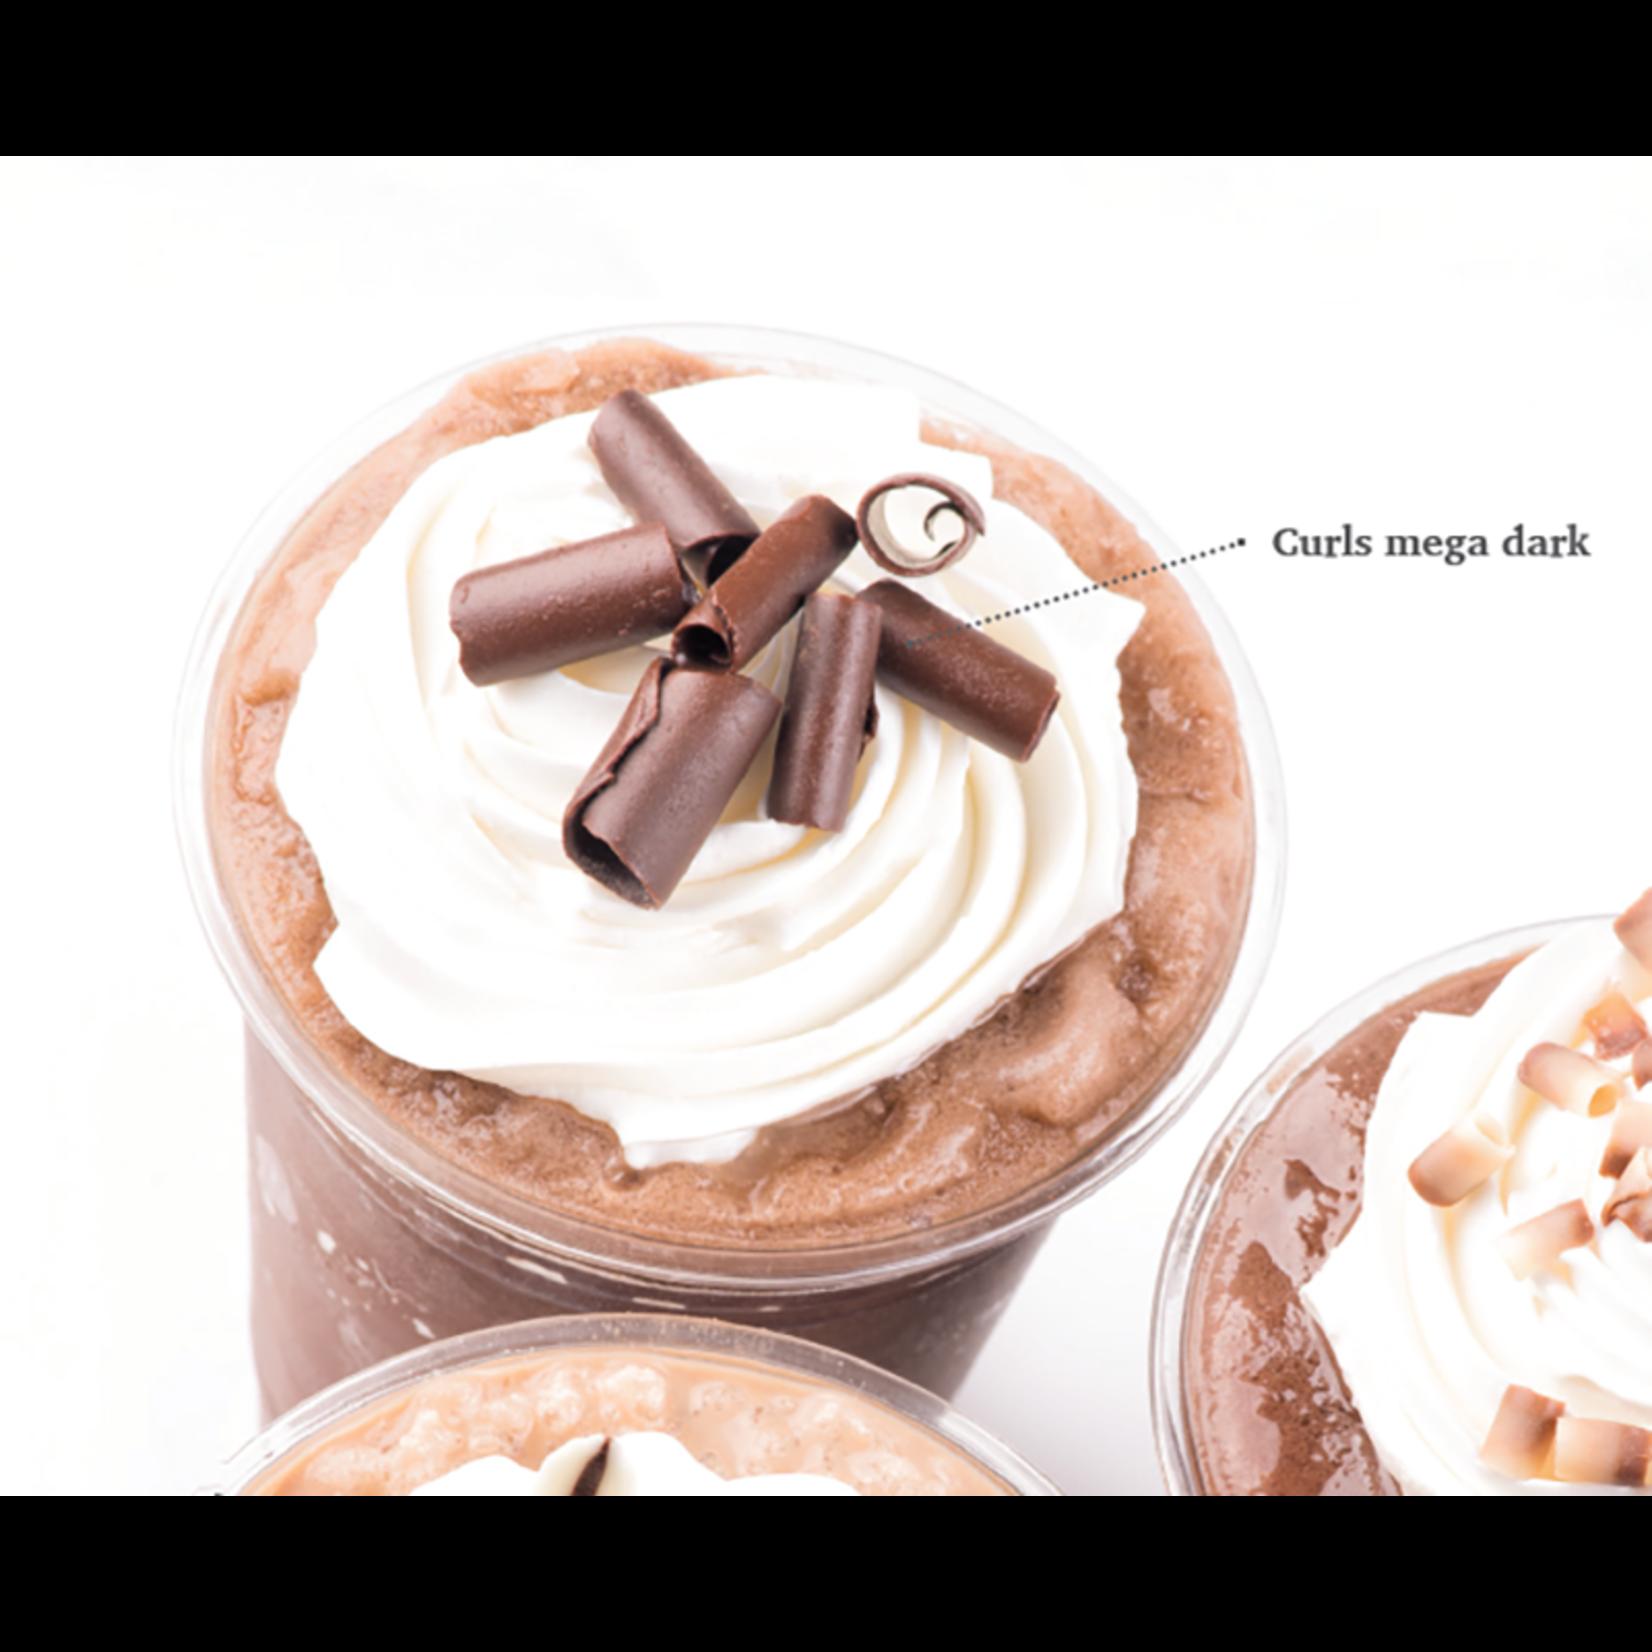 Dobla Dobla - Dark Chocolate Mega Curls - 1 lb, 41136-R